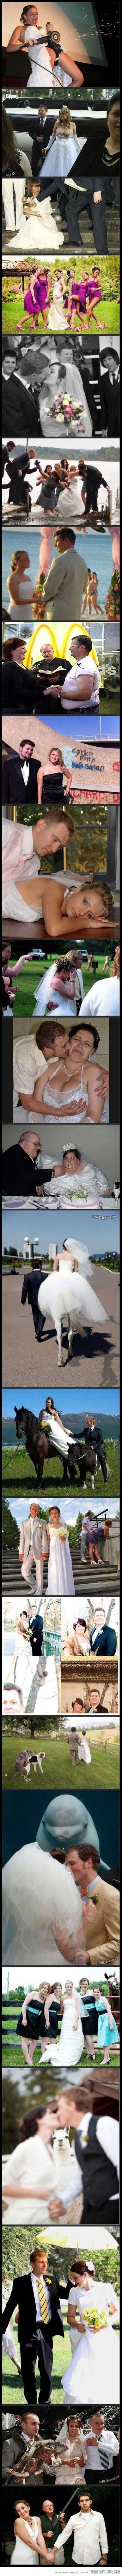 Funny Crazy Wedding Photos Picture Strip